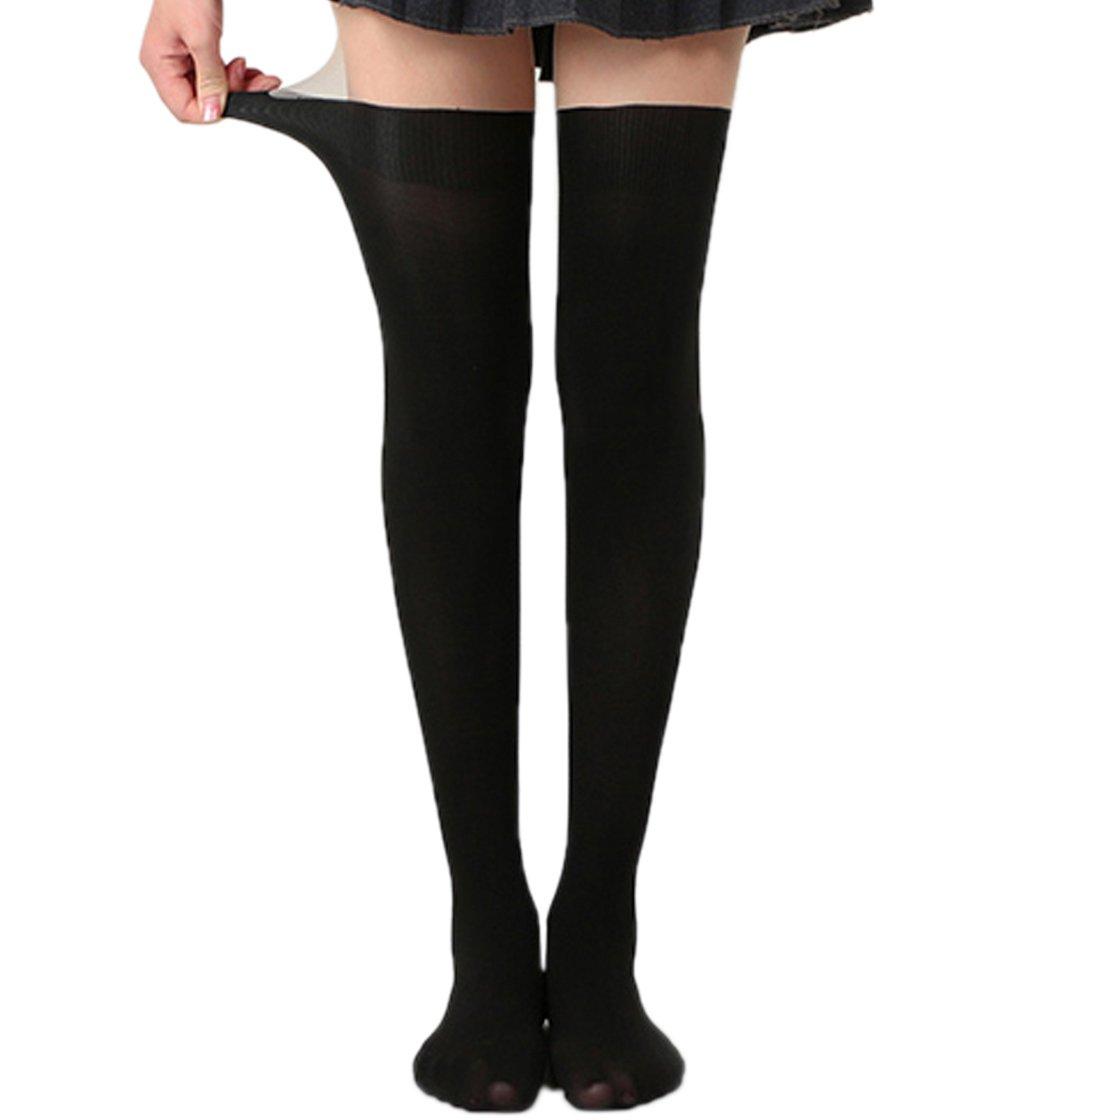 Damen Überknie Overknee Lang Socken Stricken-Strümpfe-Kniestrümpfe-Stockings w//